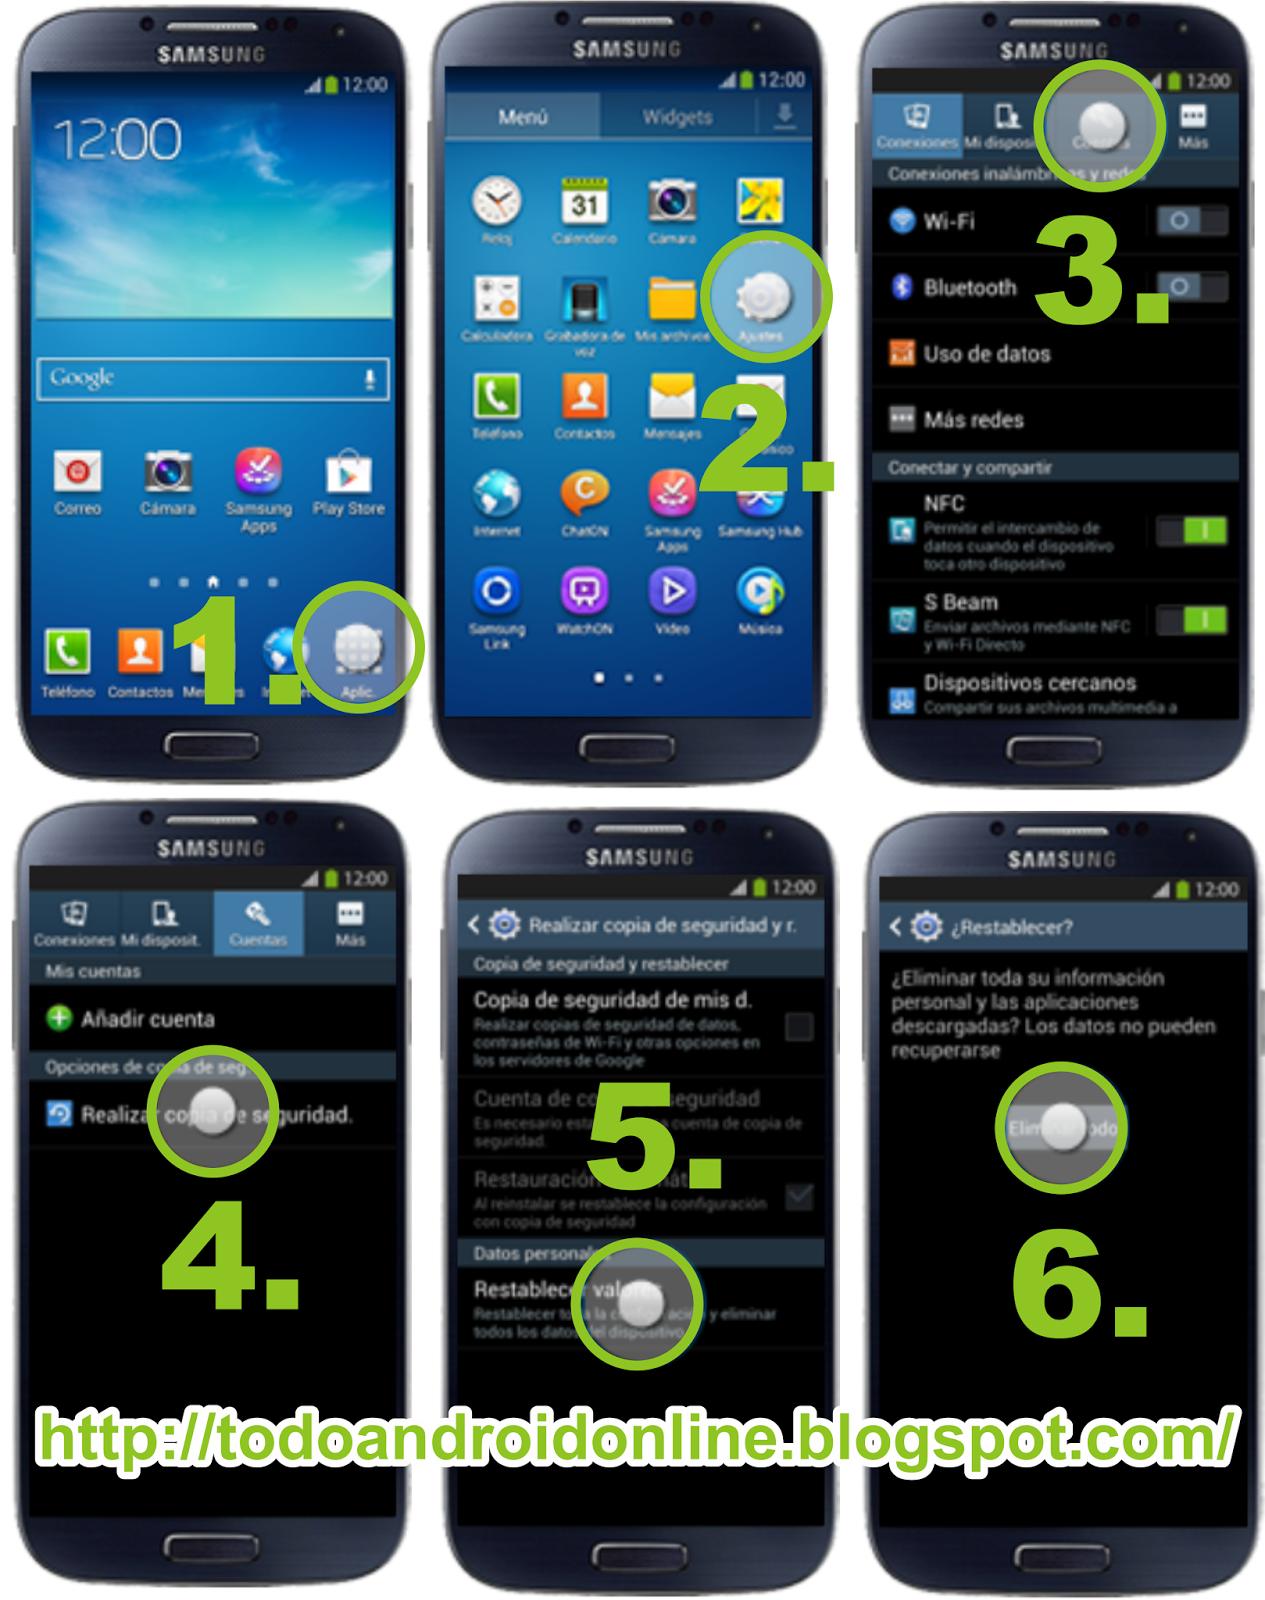 Samsung Galaxy S4 I9505, reiniciar, resetear y restablecer datos a modo fábrica